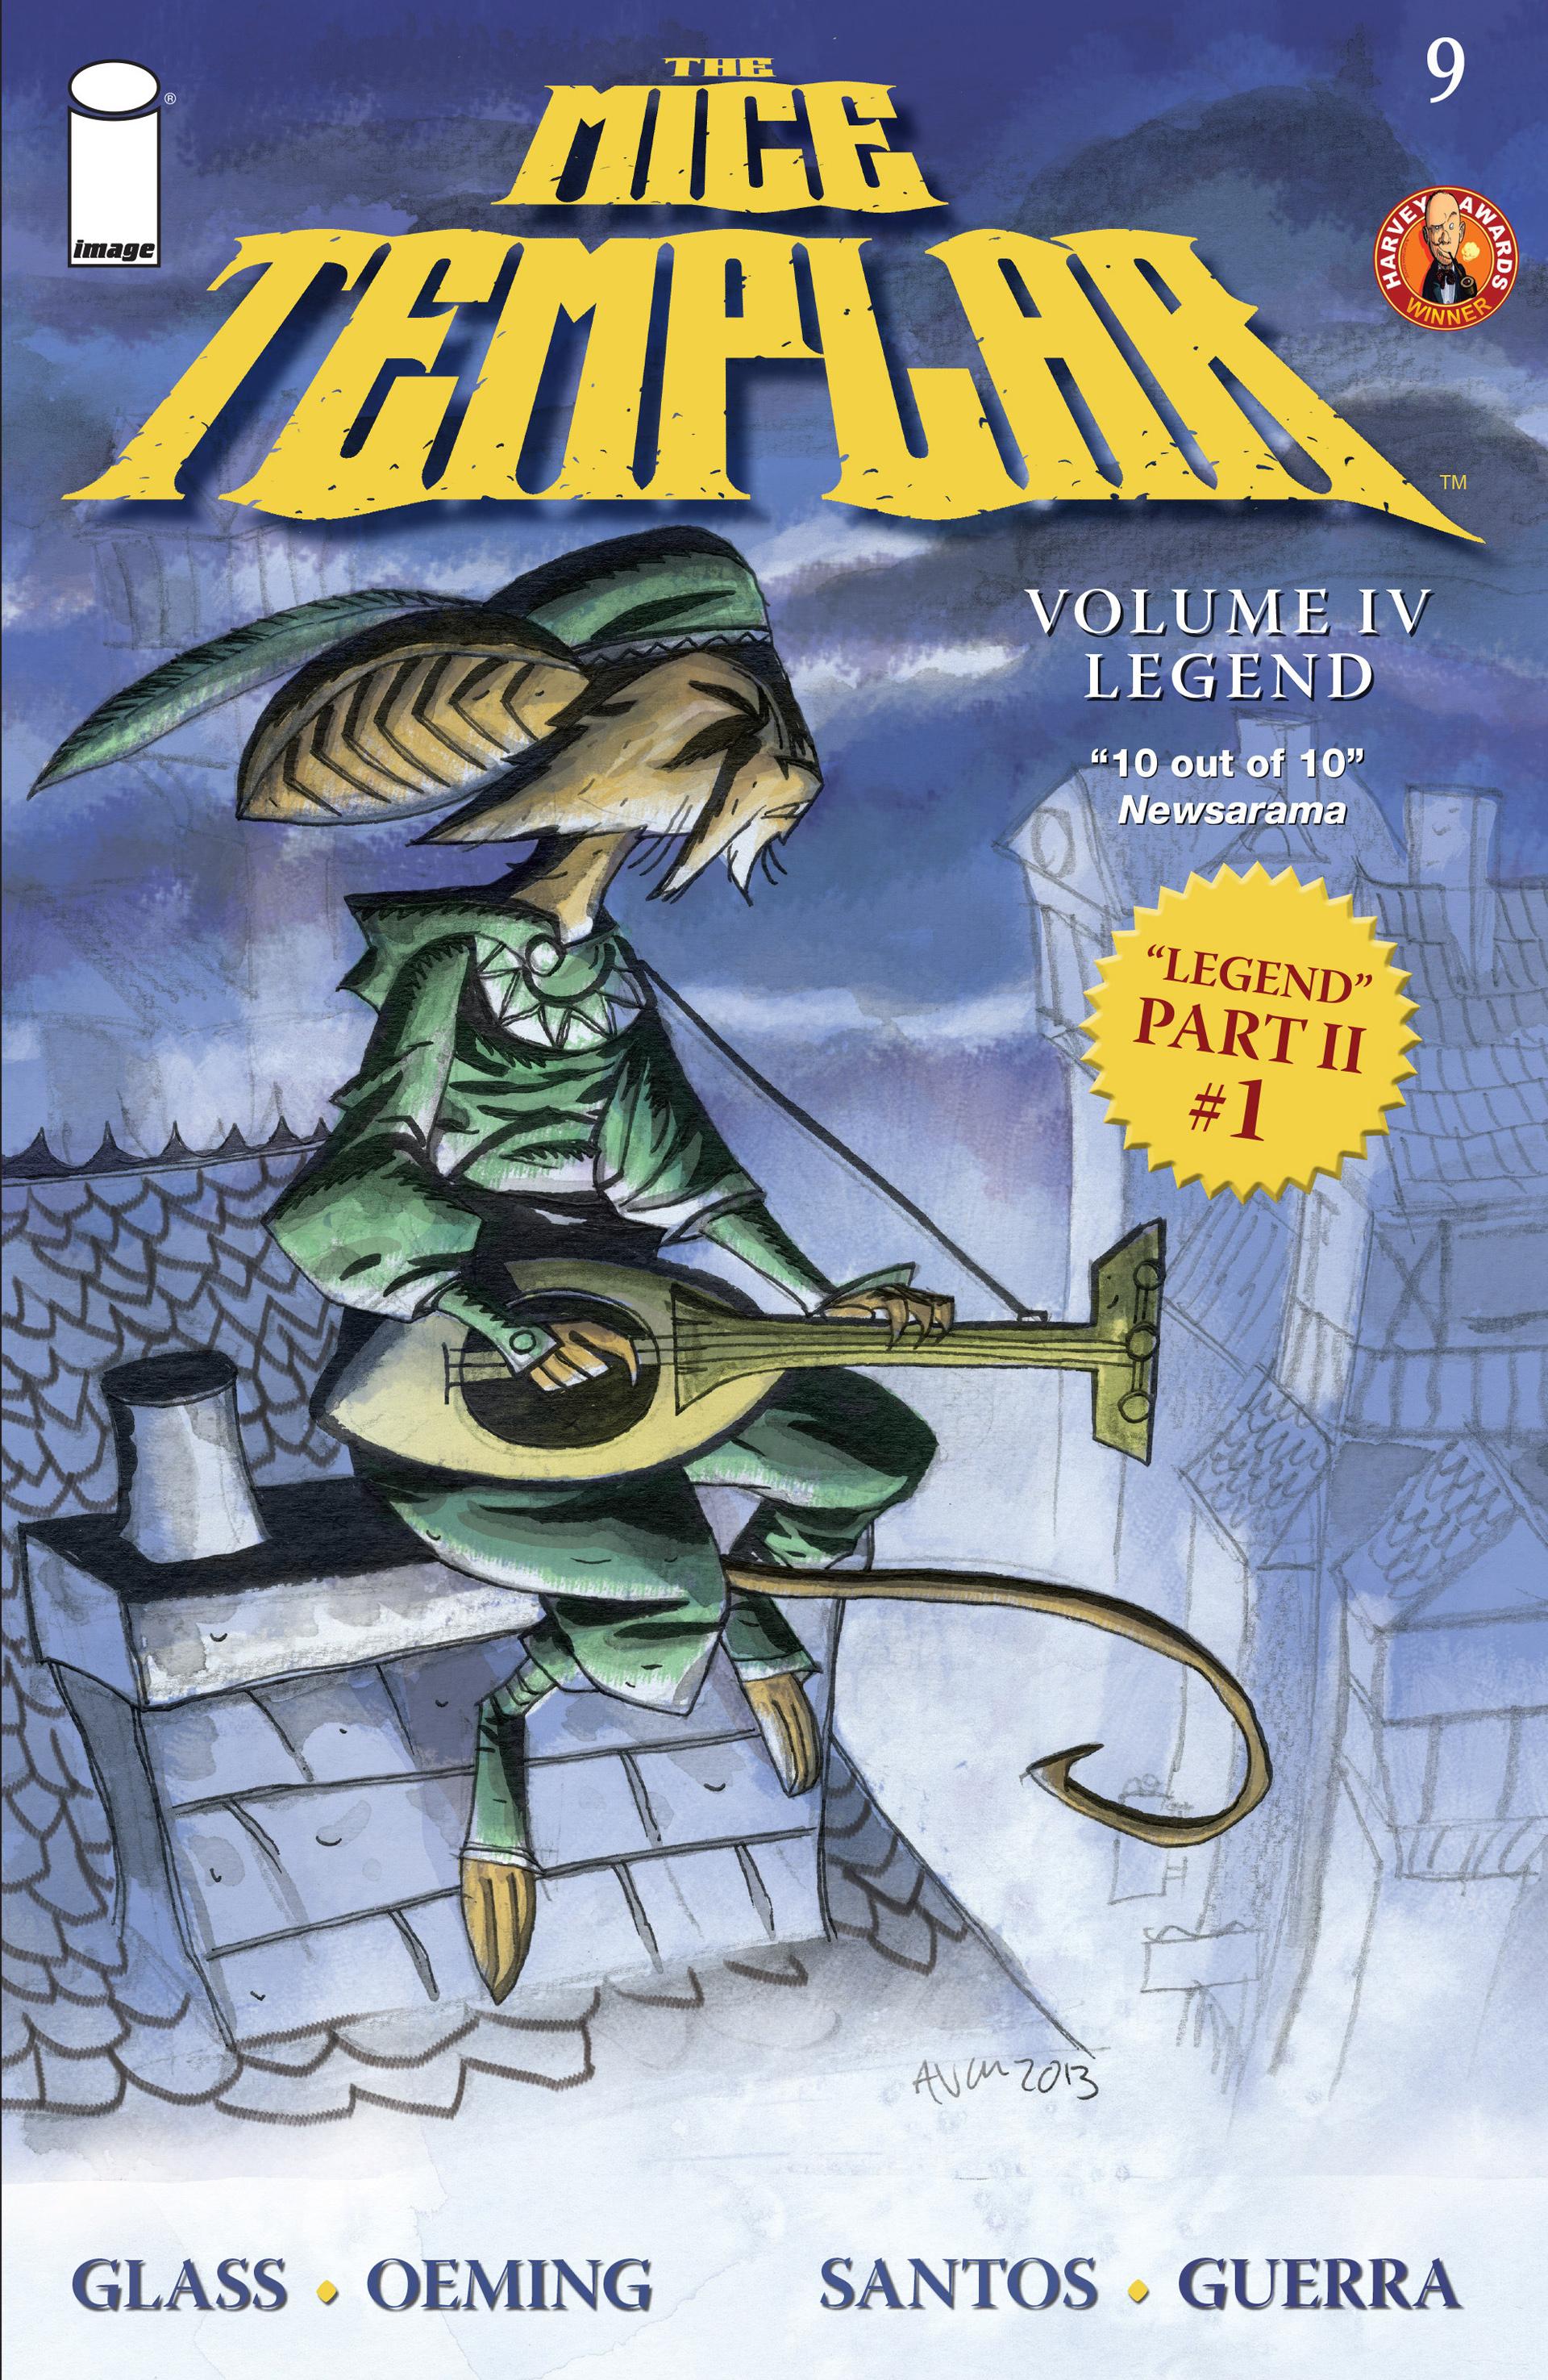 The Mice Templar Volume 4: Legend 9 Page 1